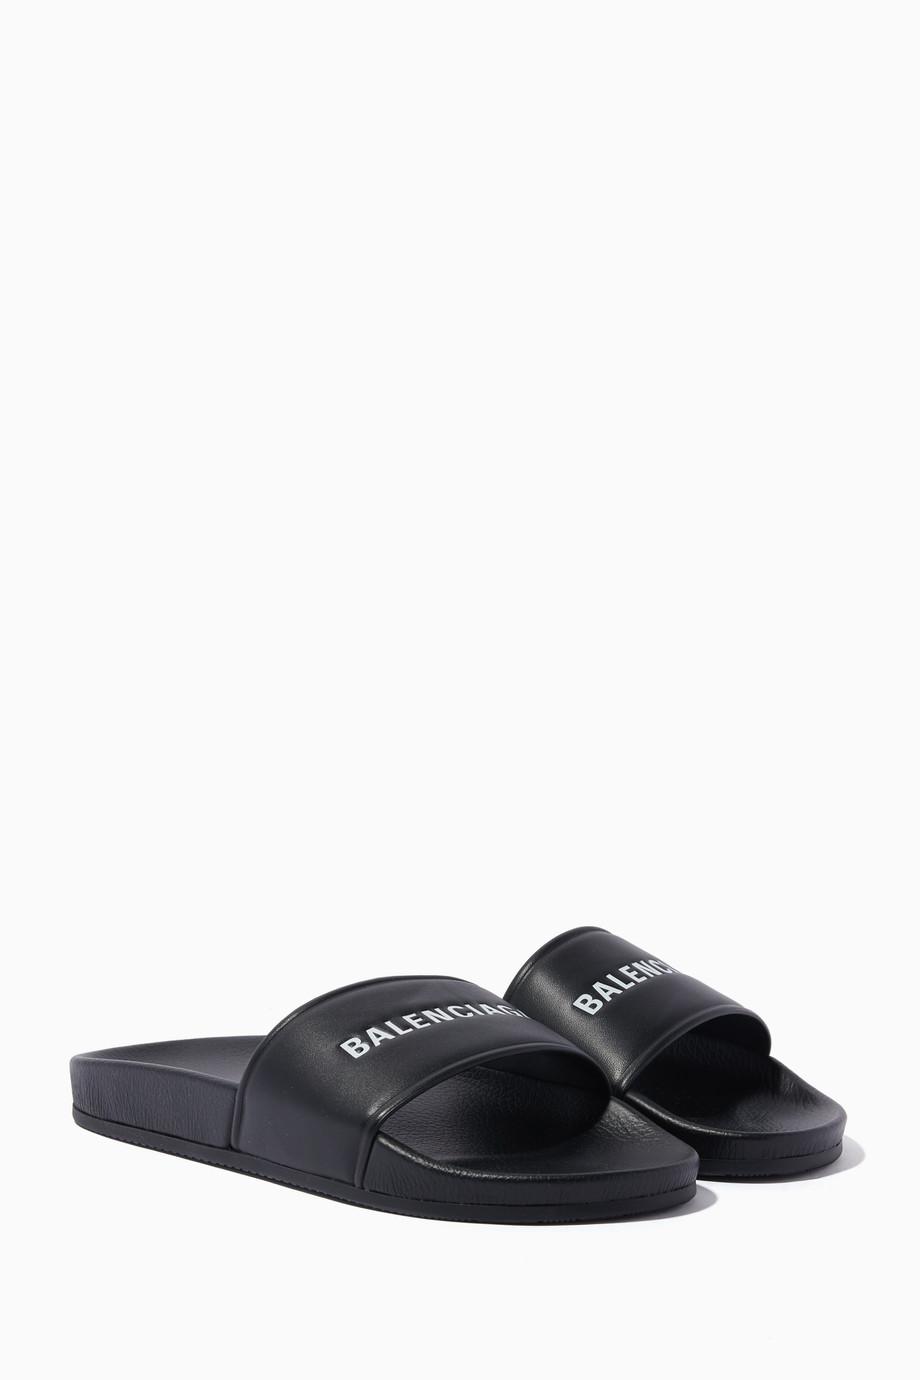 da25eea7f72c Shop Balenciaga Black Black Leather Logo Slides for Women